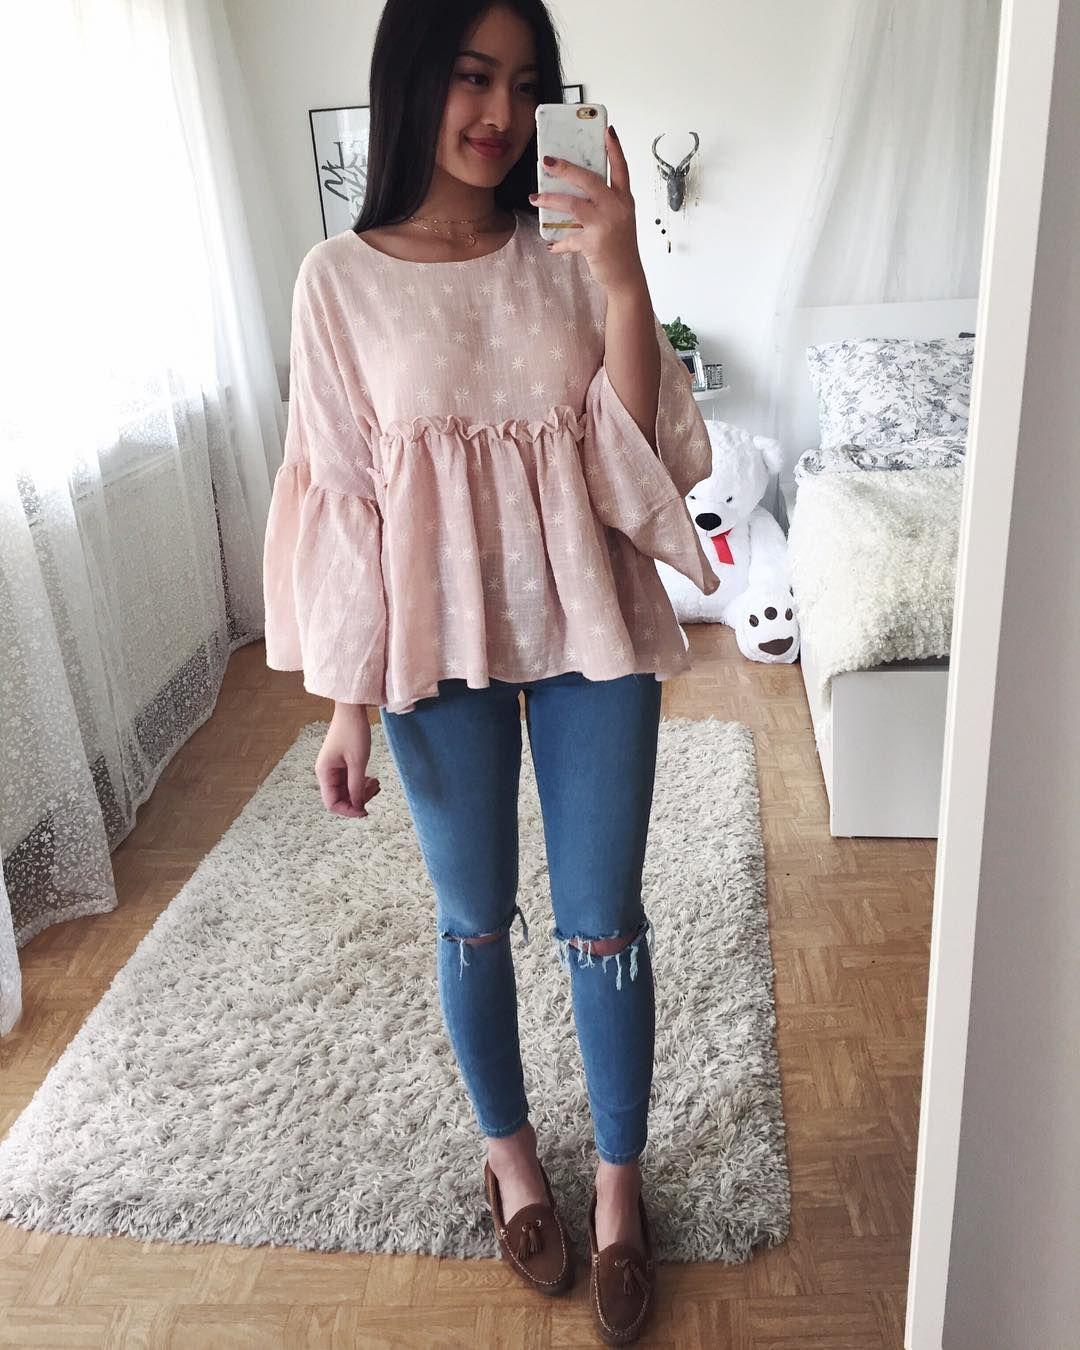 Pin de Marizella en clothing en 2019 | Pinterest | Fashion ...